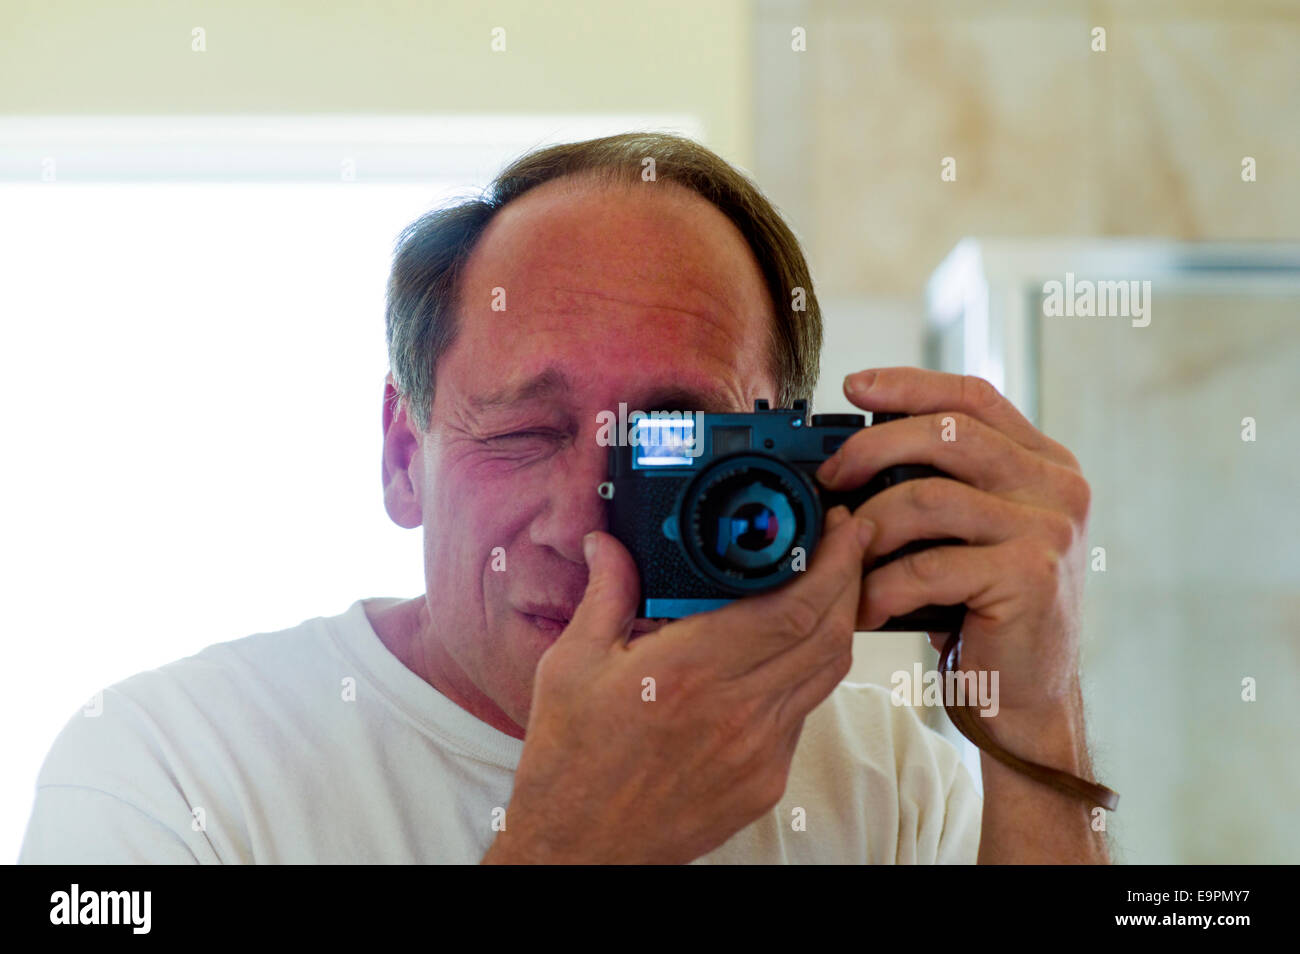 Leica Picture Stockfotos & Leica Picture Bilder - Alamy